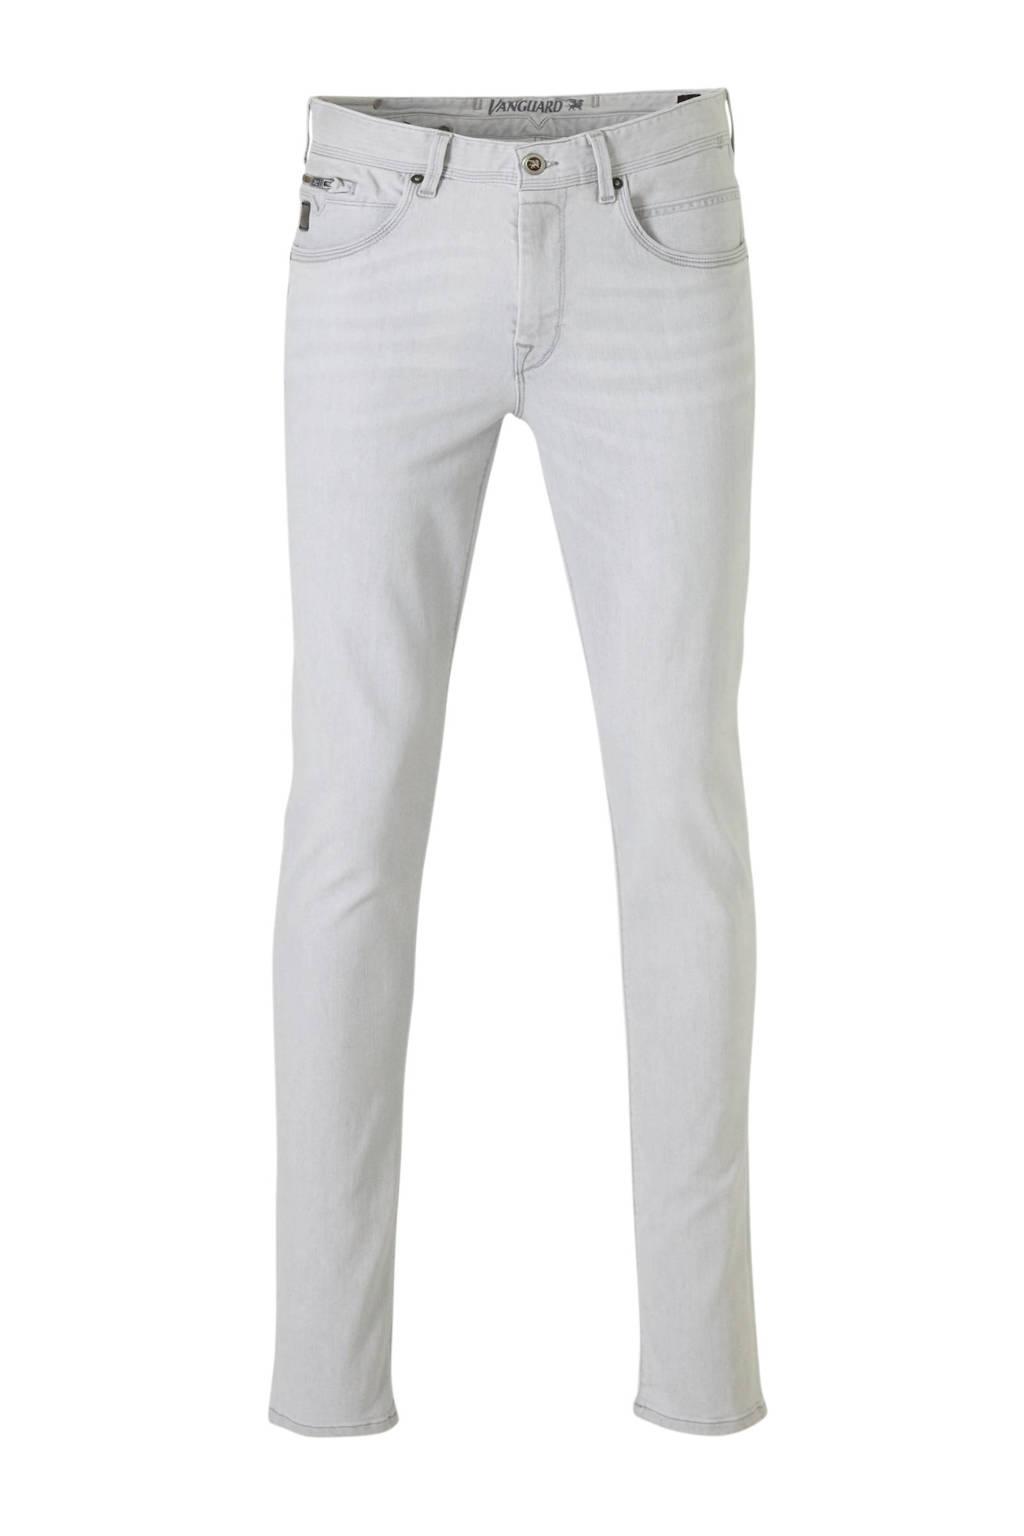 Vanguard regular fit jeans lichtgrijs, Lichtgrijs